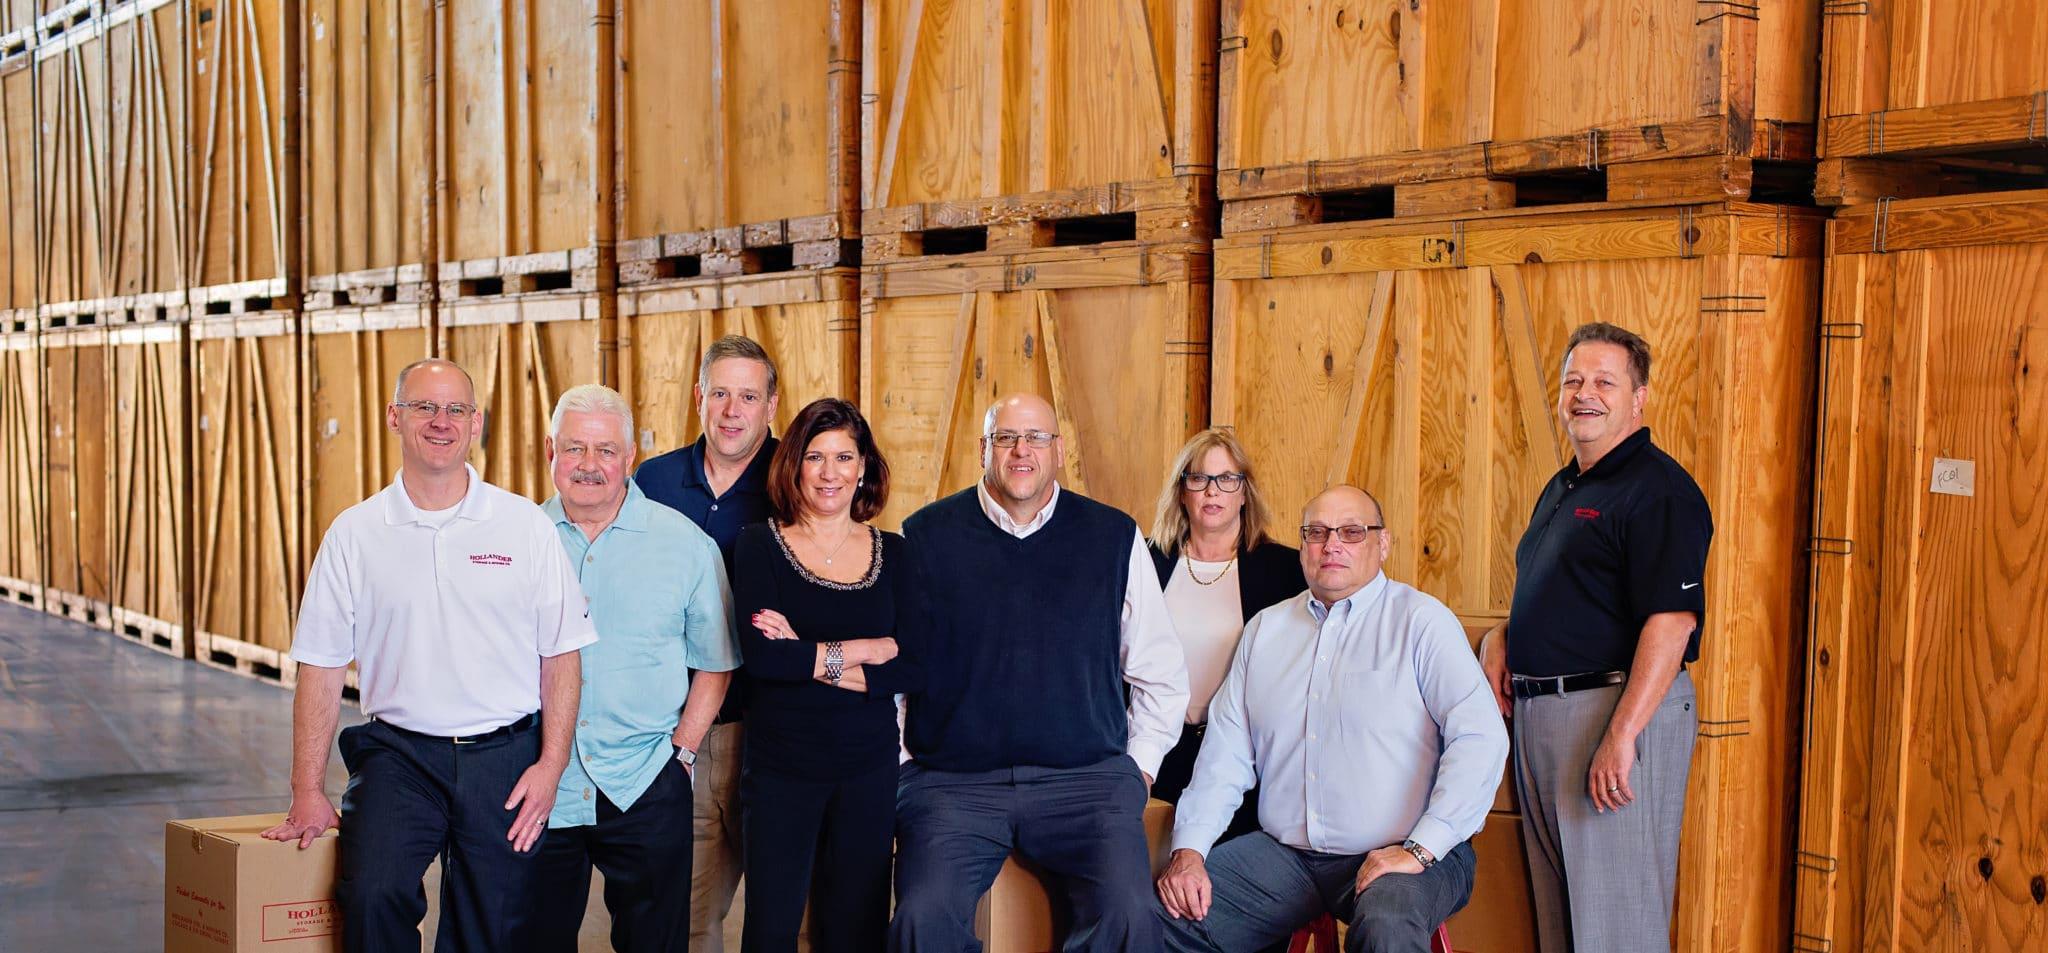 The Hollander Sales Team